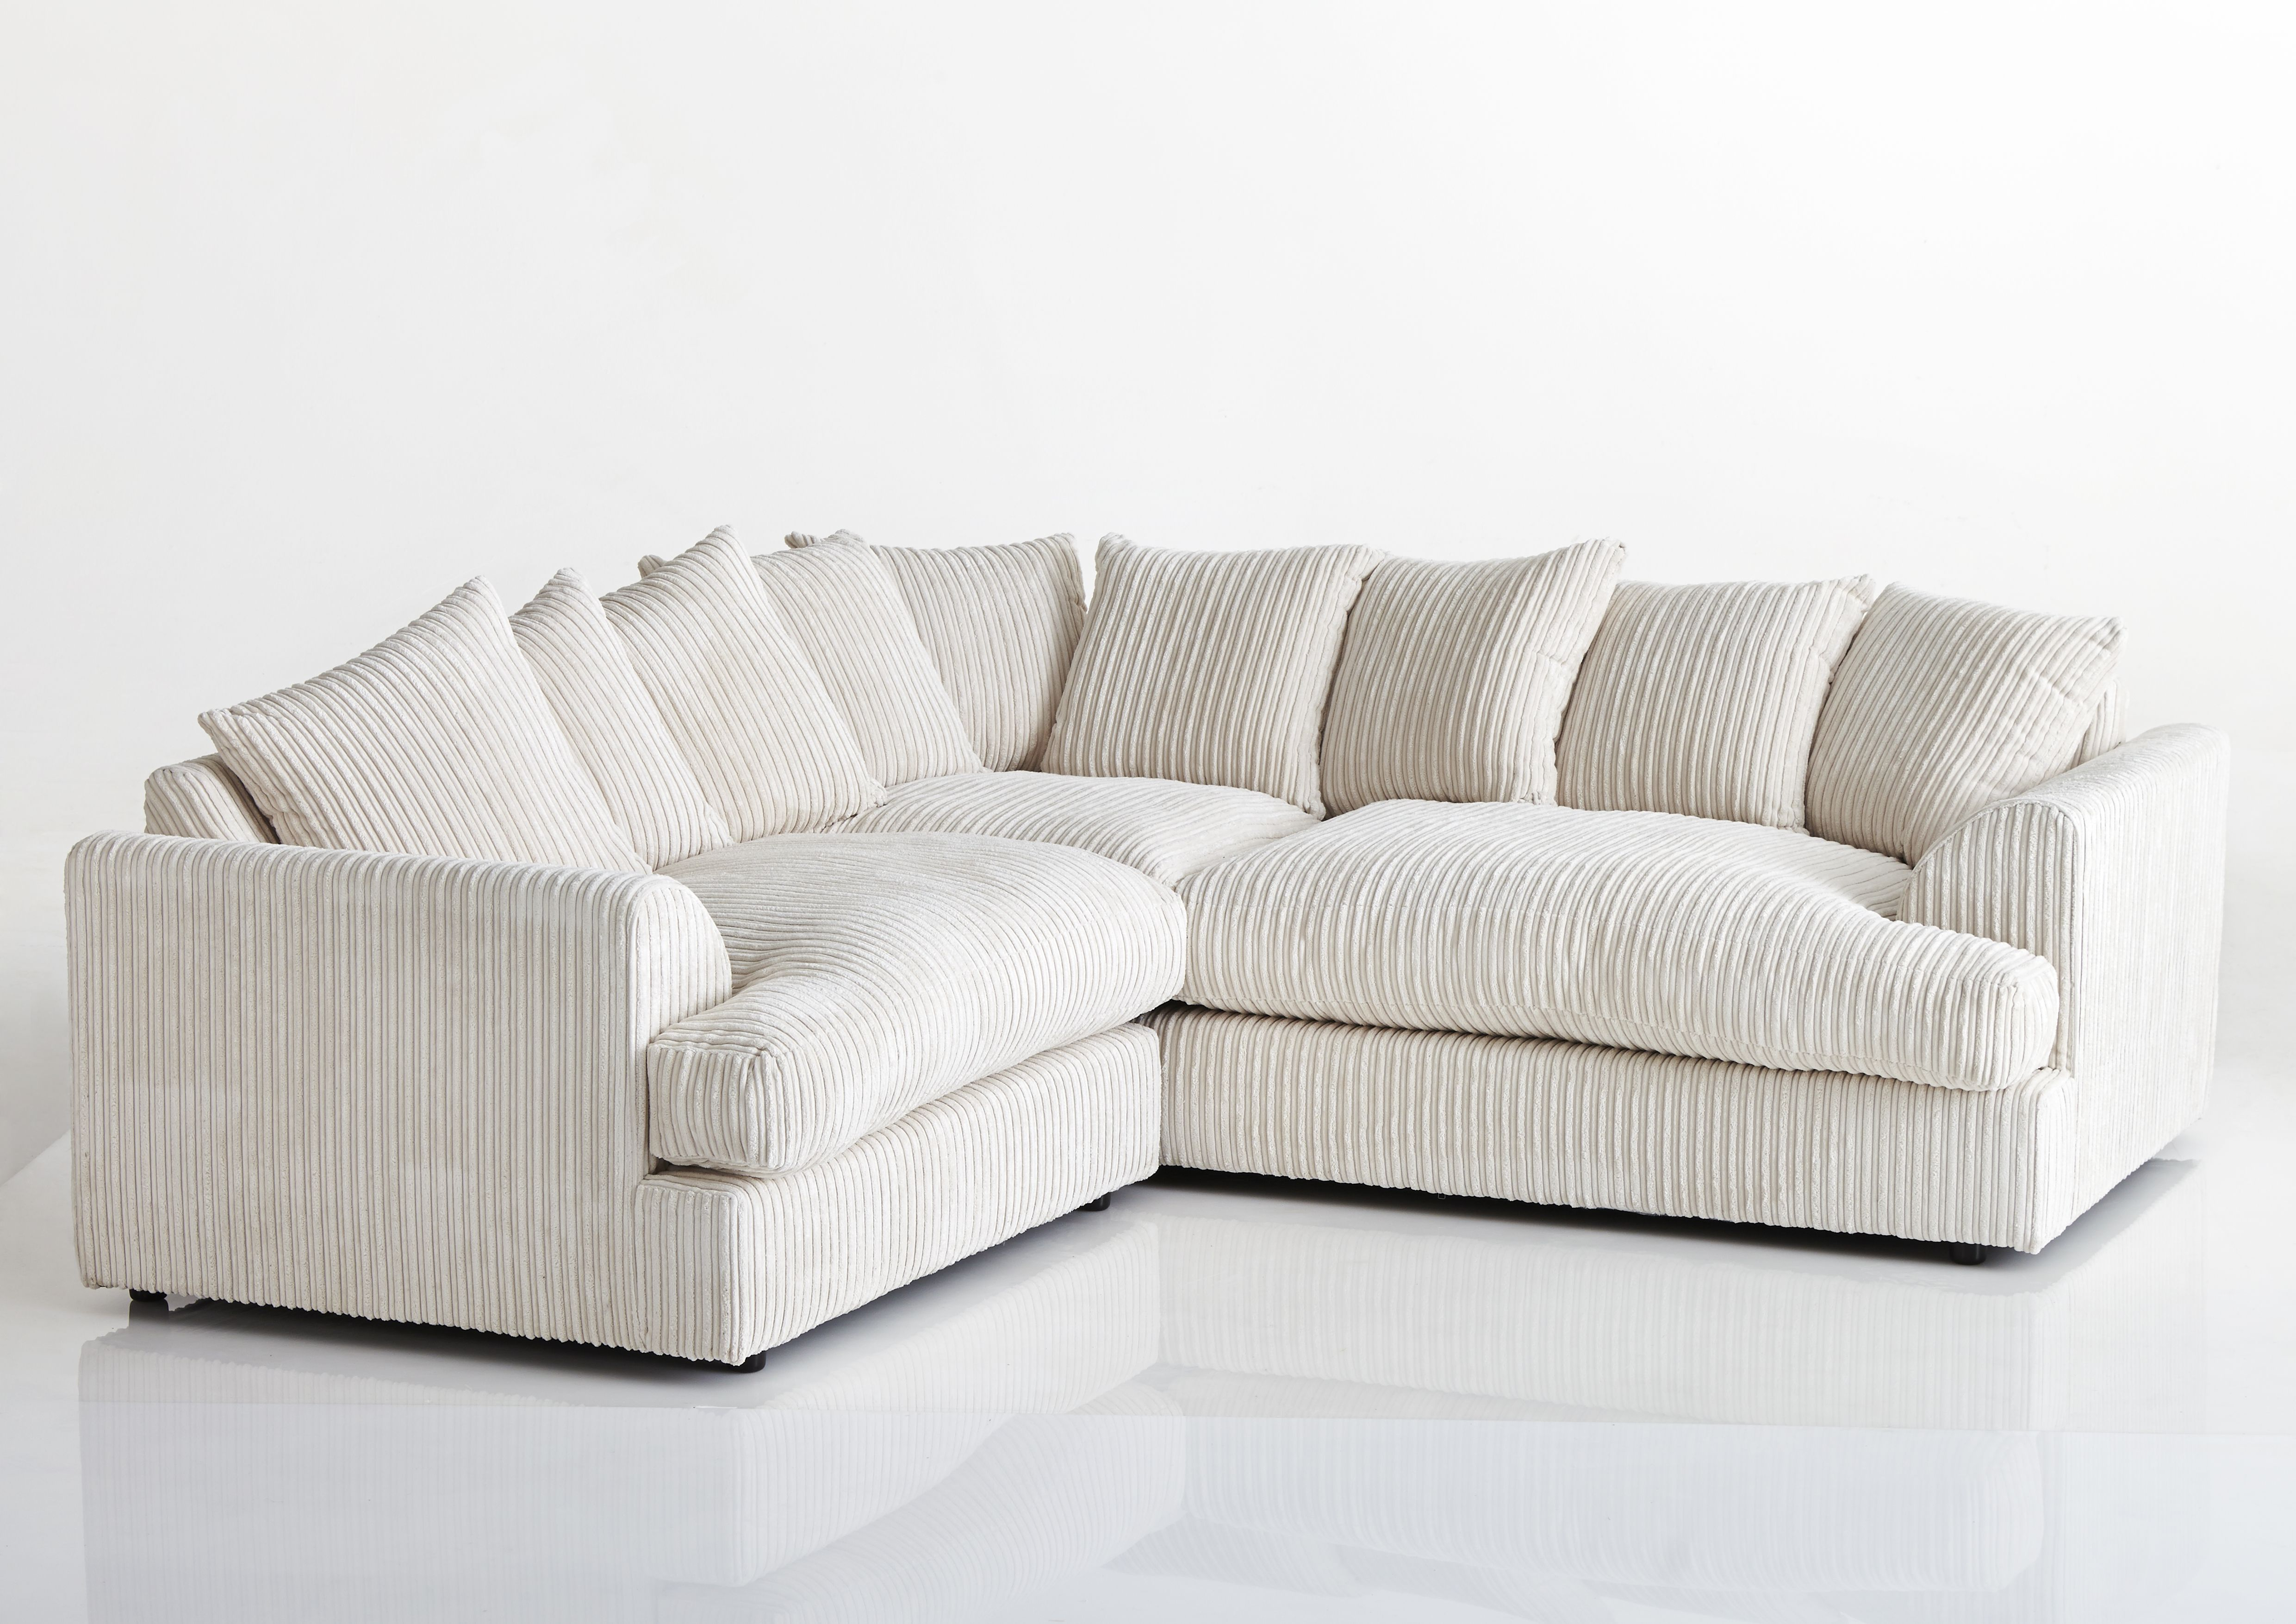 Fabric Sofas Sofa Styles Corner Sofa Comfy Corner Sofa Fabric Sofa